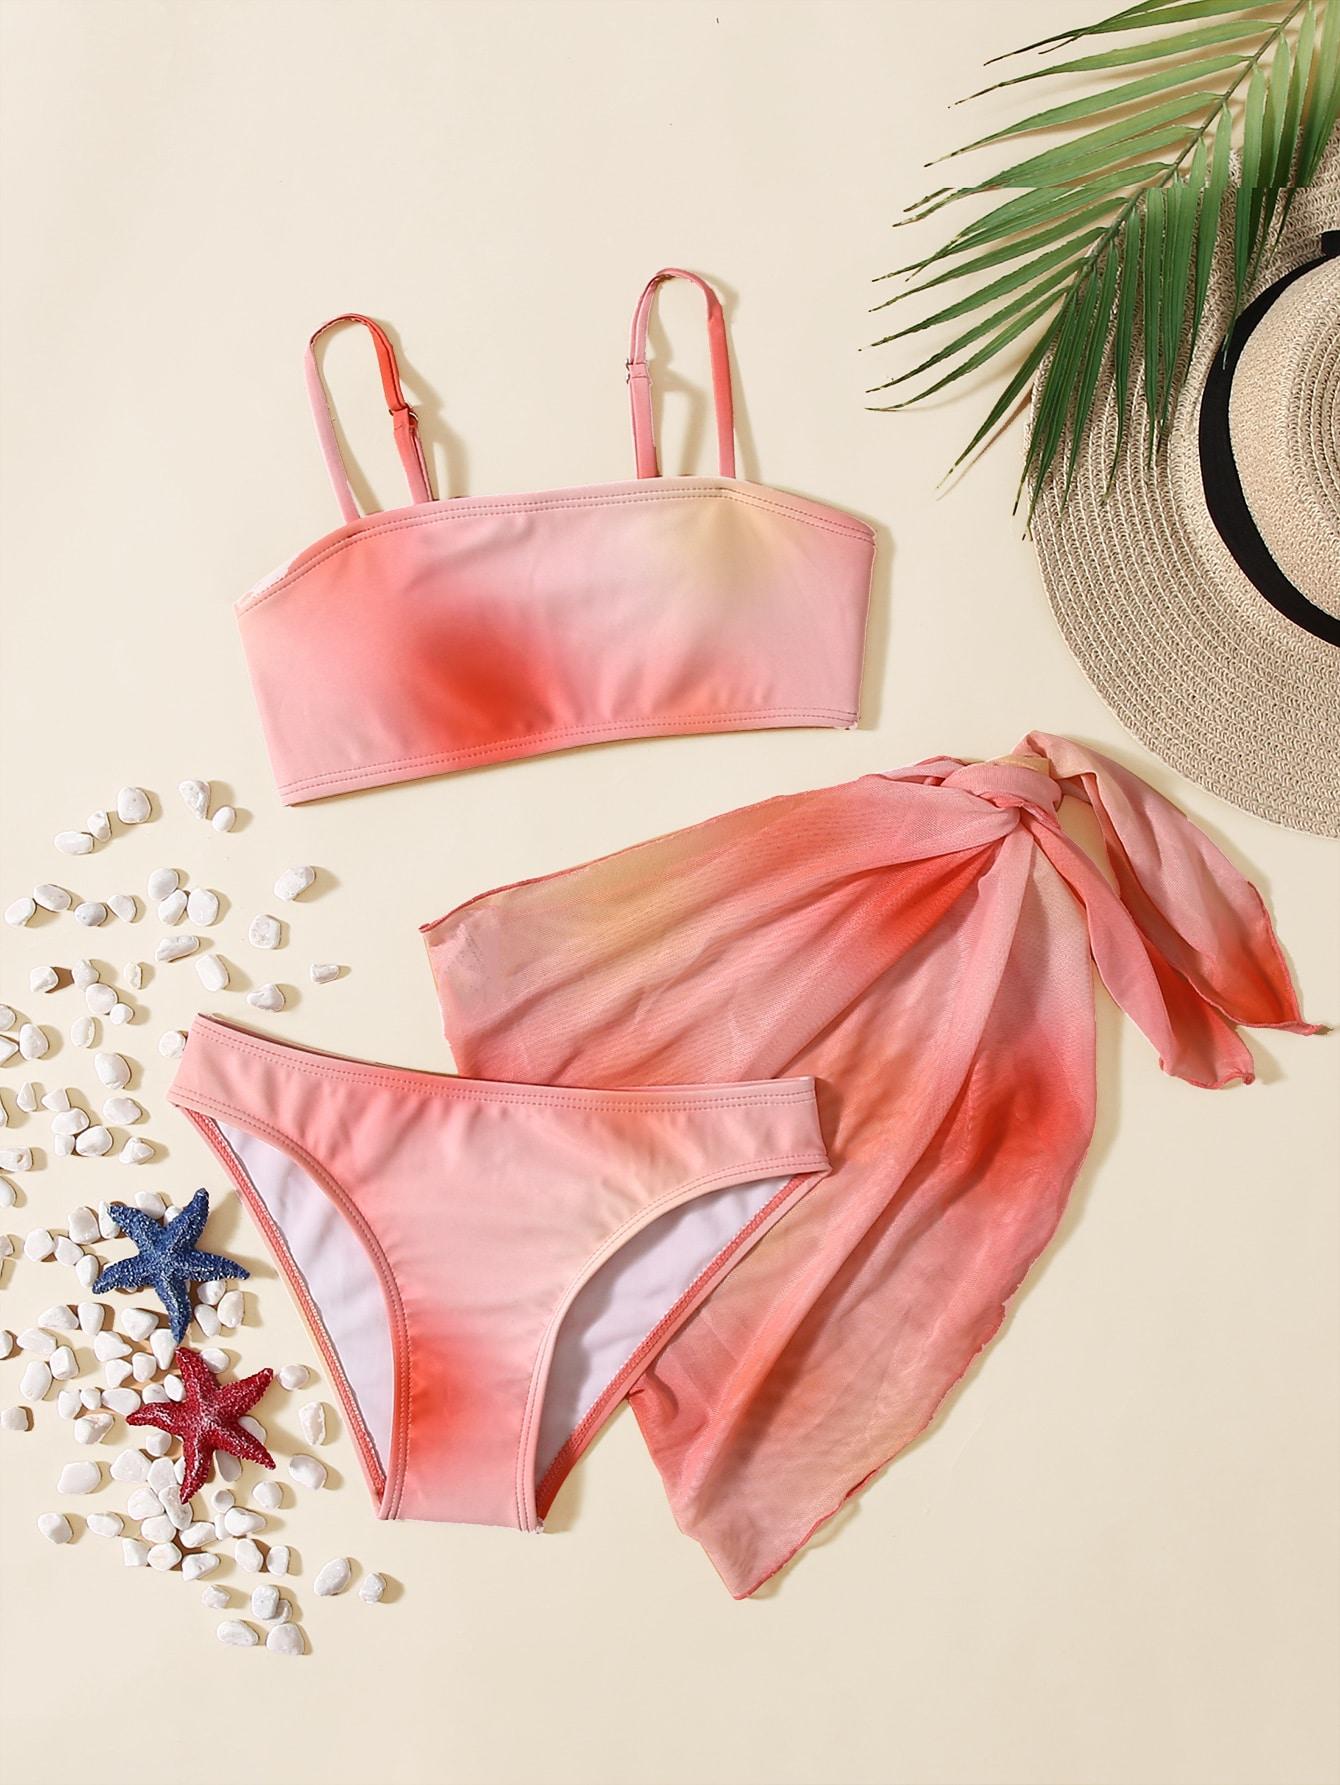 4Pack Girls Ombre Bikini Swimsuit & Beach Skirt